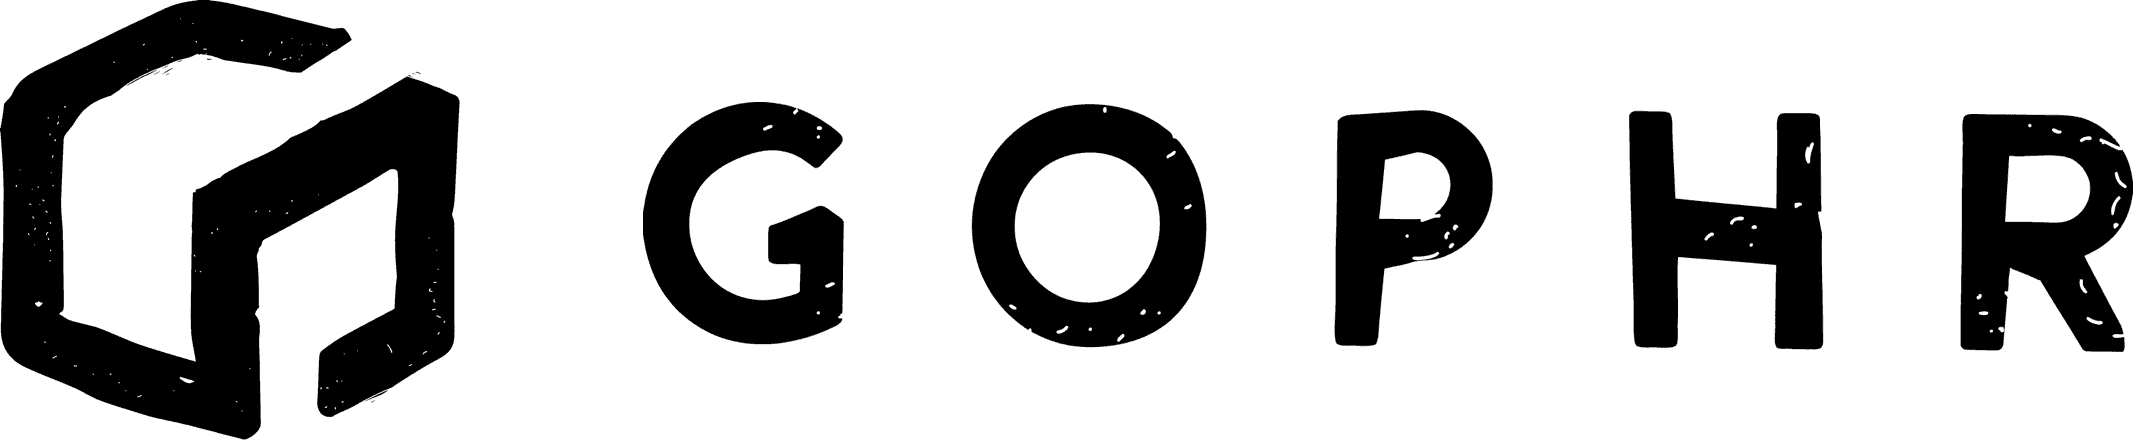 Gophr-logo